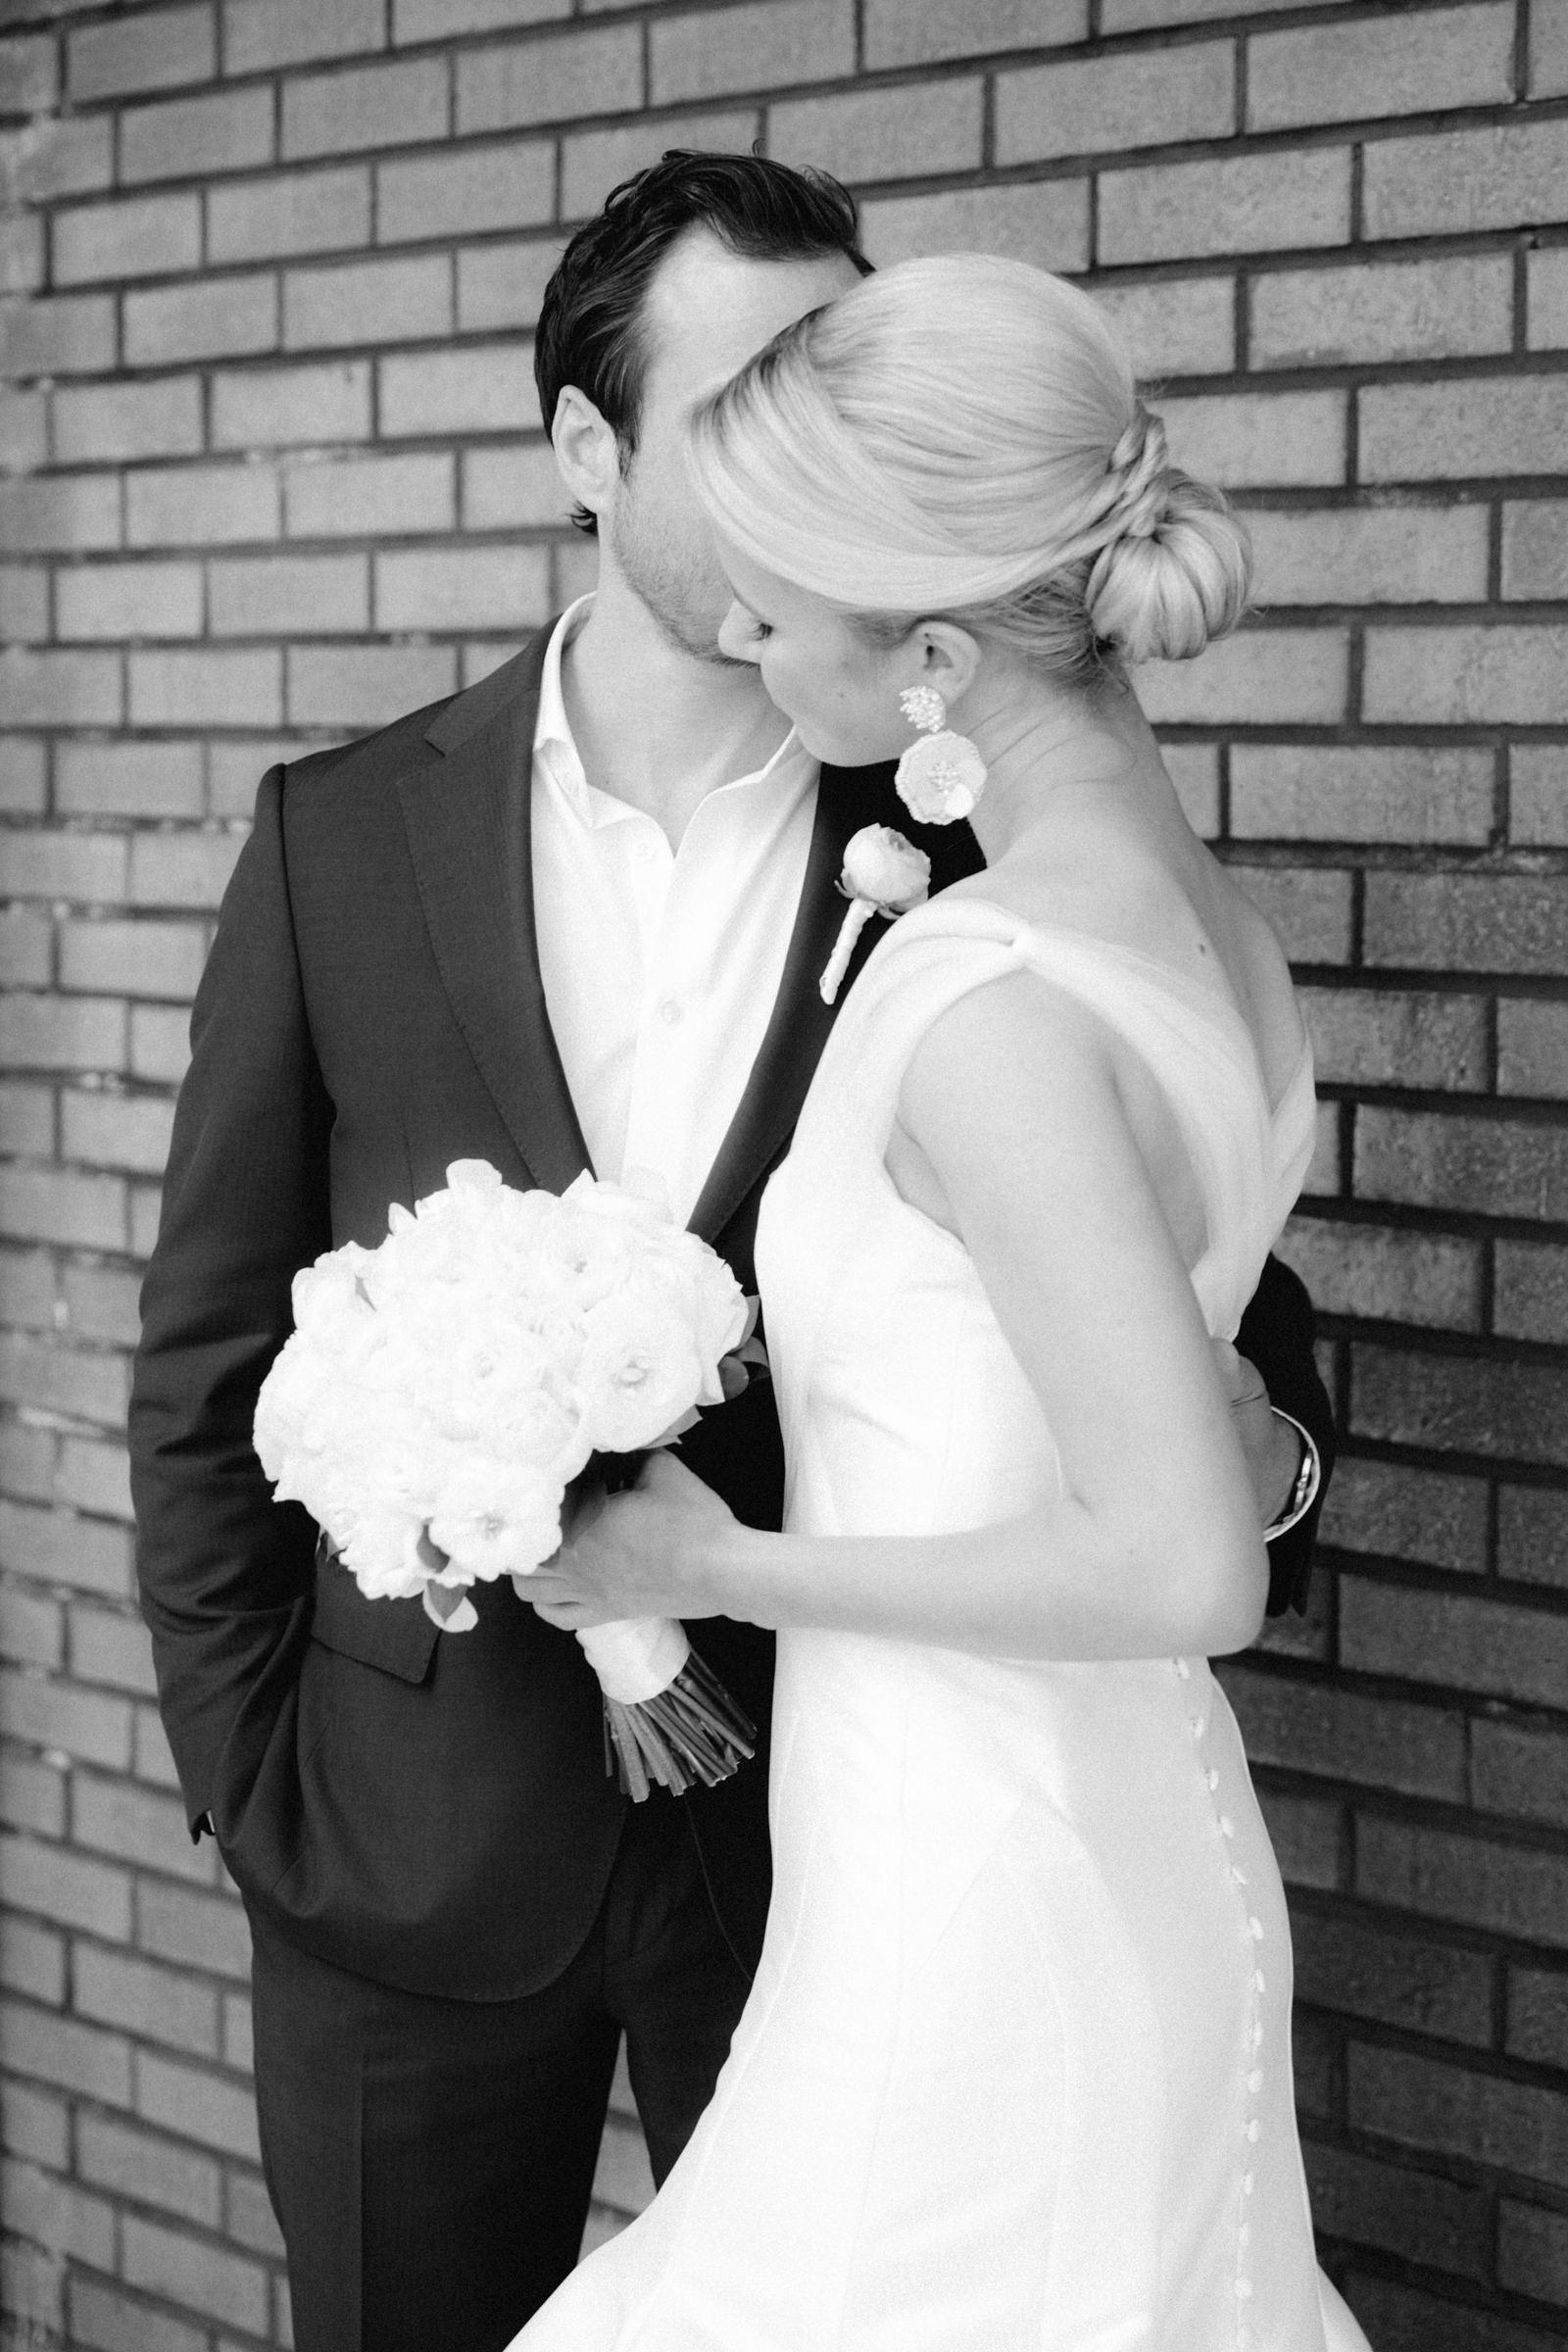 Intimate-NYC_wedding_ by Tanya Isaeva-87.jpg